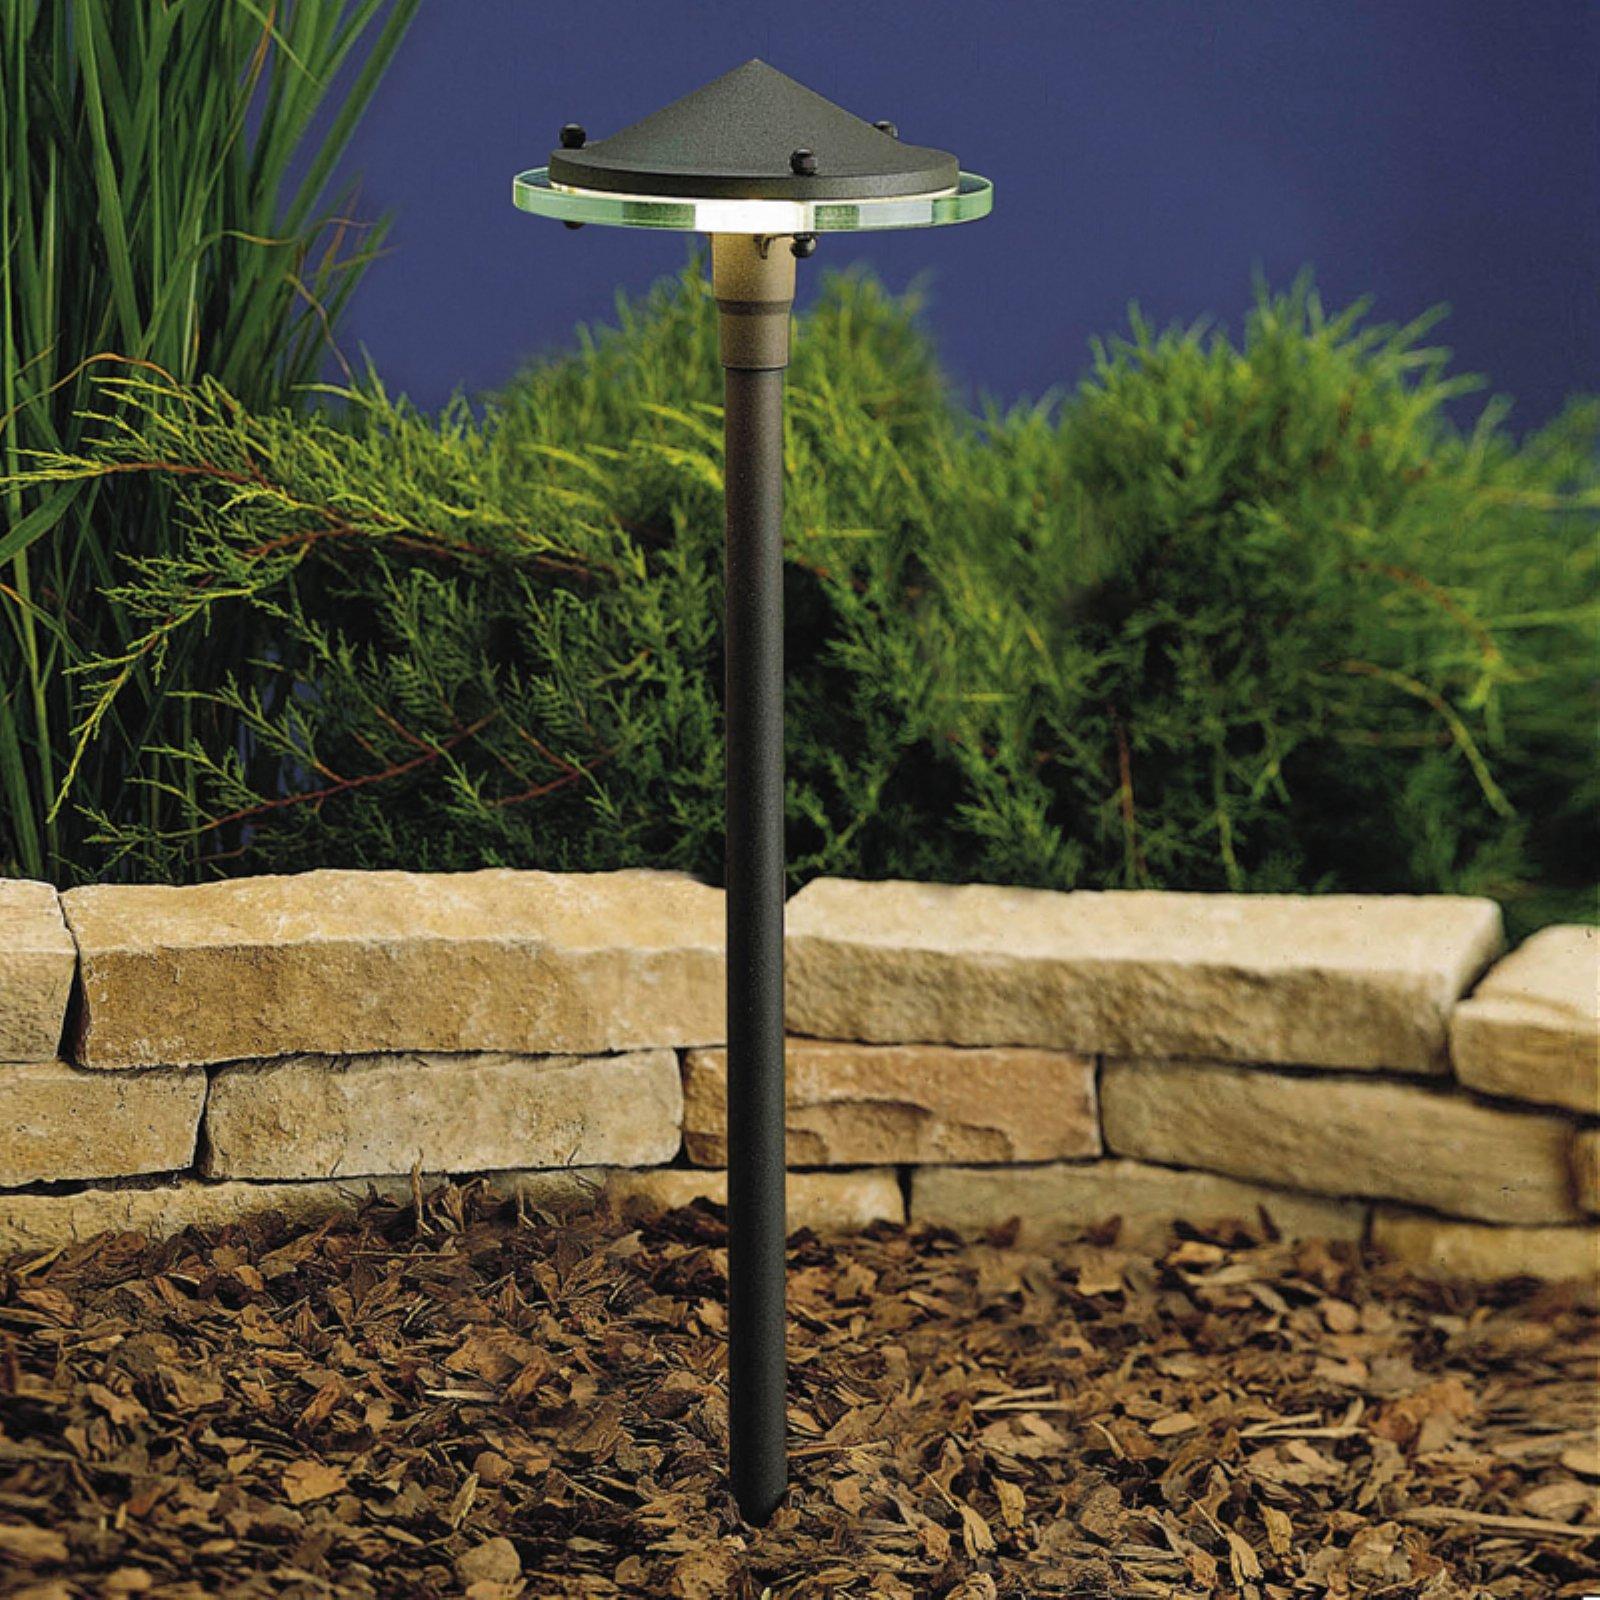 Kichler Glass Metal Landscape Path Light Path Lights Outdoor Path Lighting Landscape Lighting